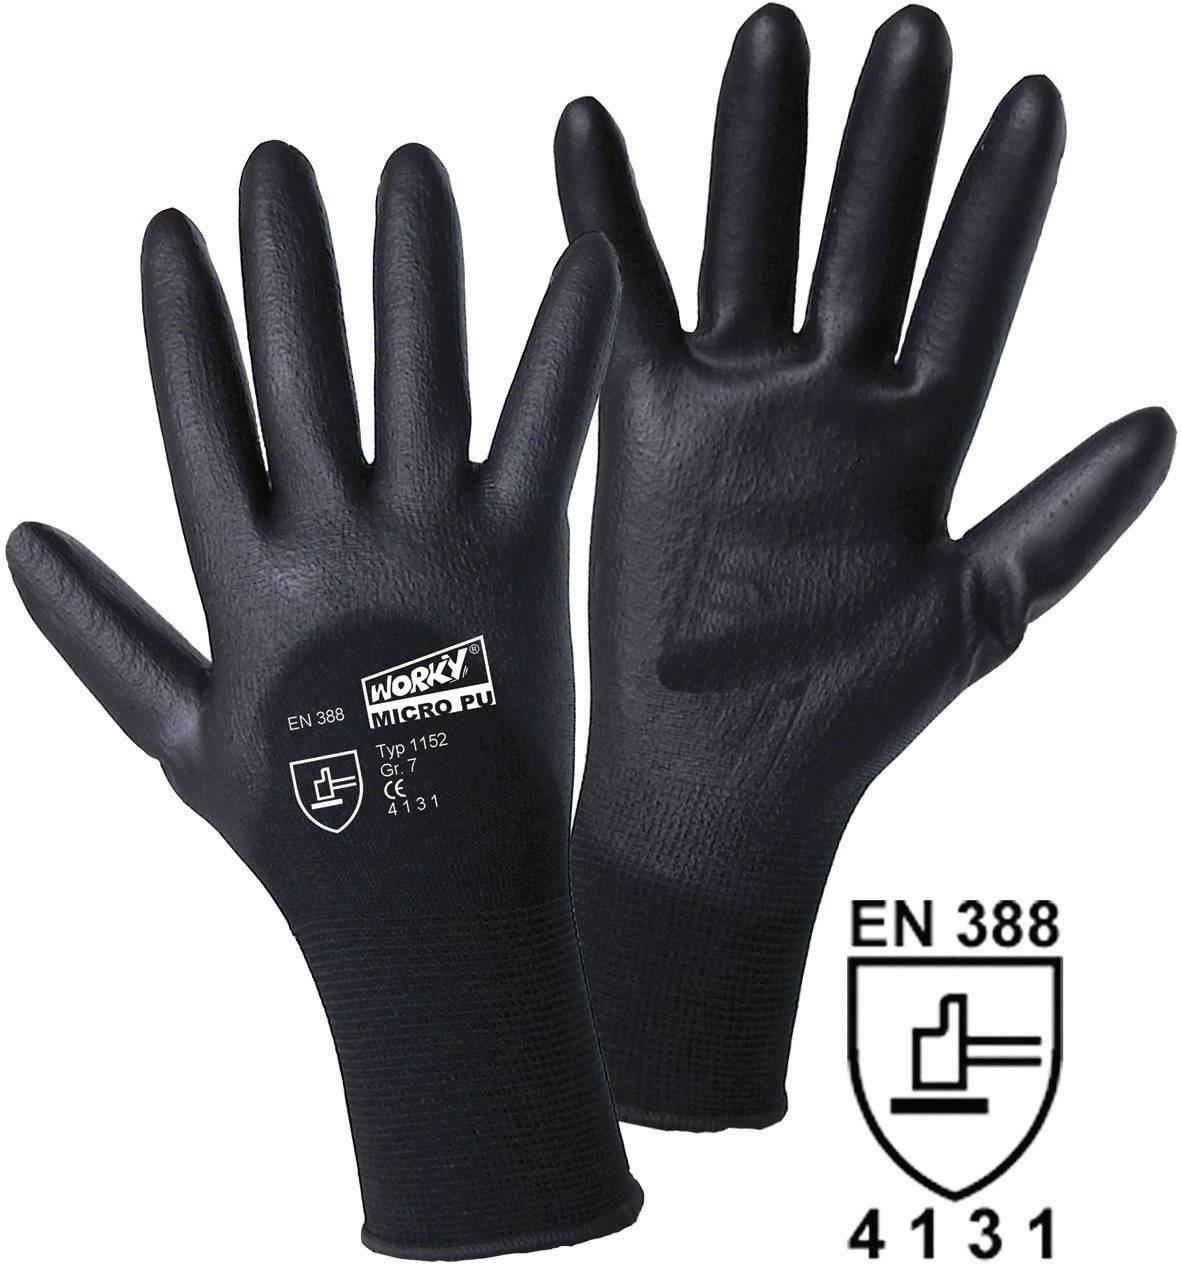 Pracovné rukavice worky MICRO black 1152, velikost rukavic: 10, XL